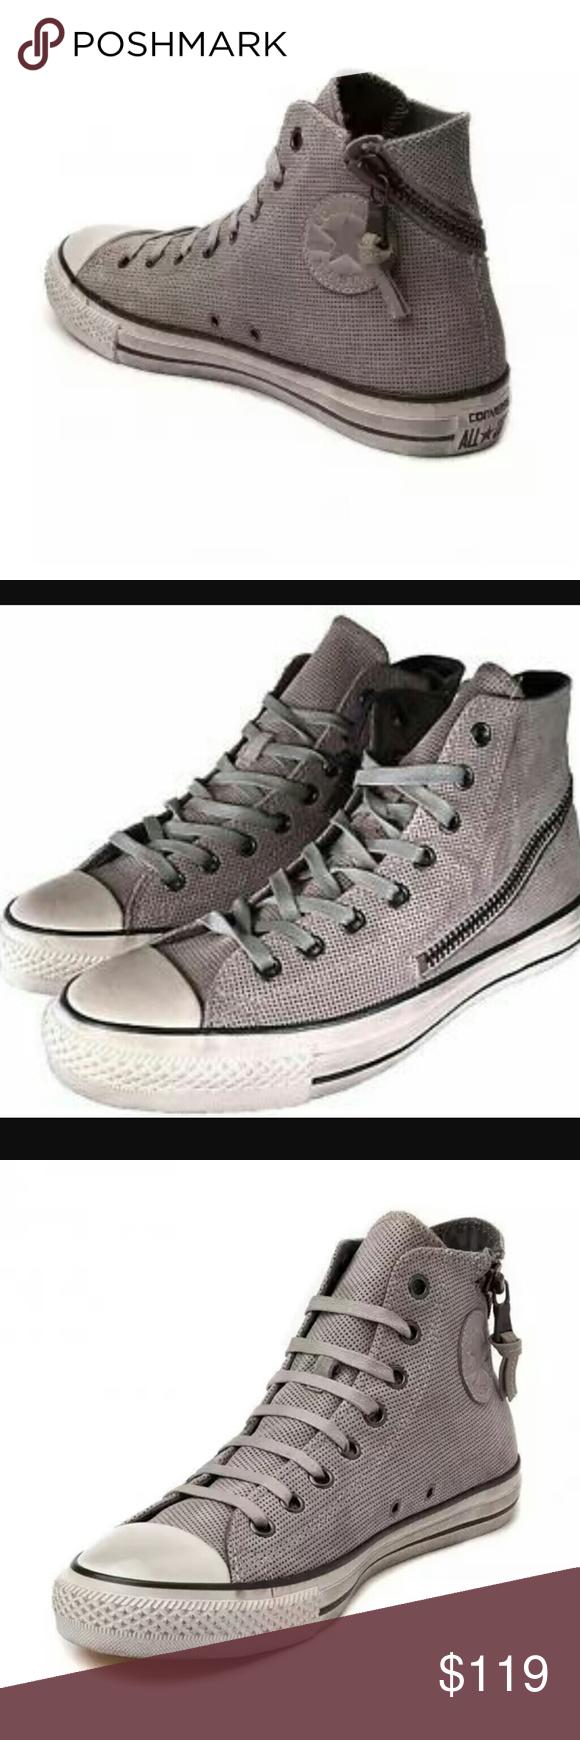 ce6e57dbbc15 Converse John Varvatos Chuck Taylor Tornado Zip Hi - Brand new in box -  Converse X John Varvatos dust cover  shoe bag included - Converse Chuck  Taylor All ...